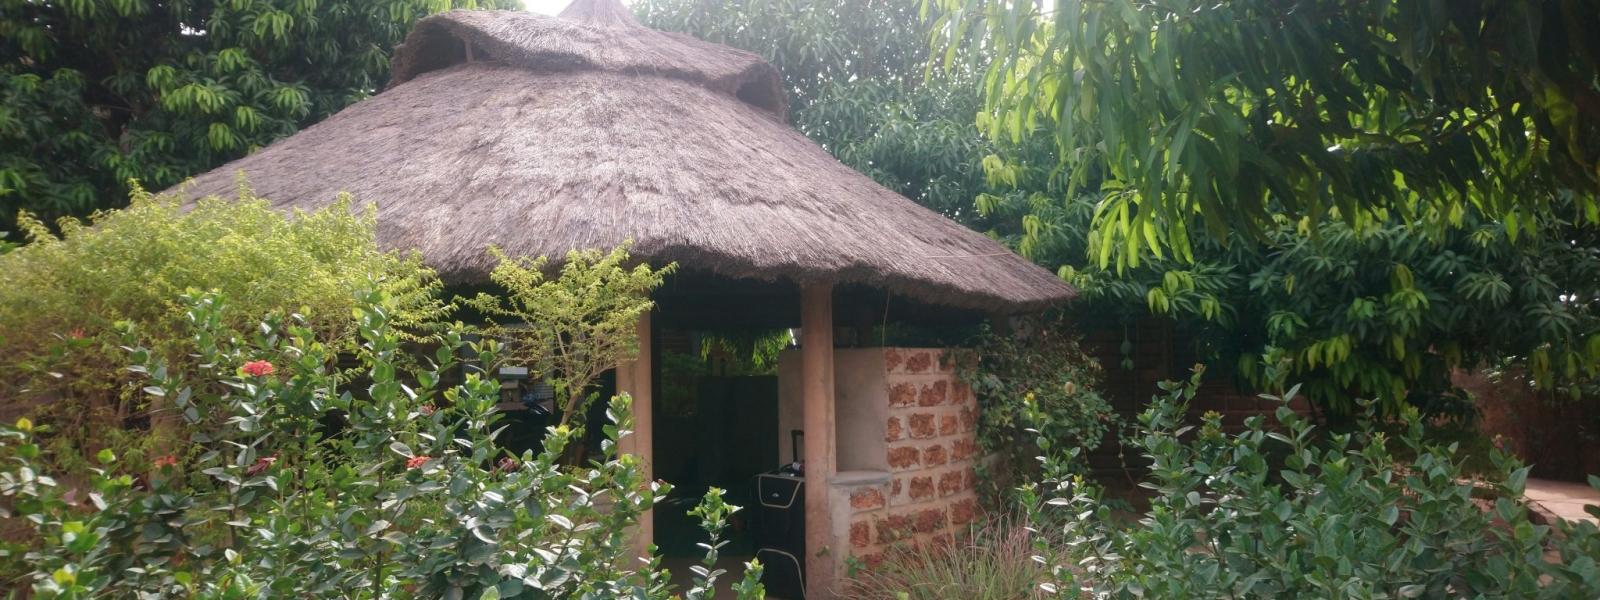 GUEST HOUSE BAOBAD DE - NOUSOL